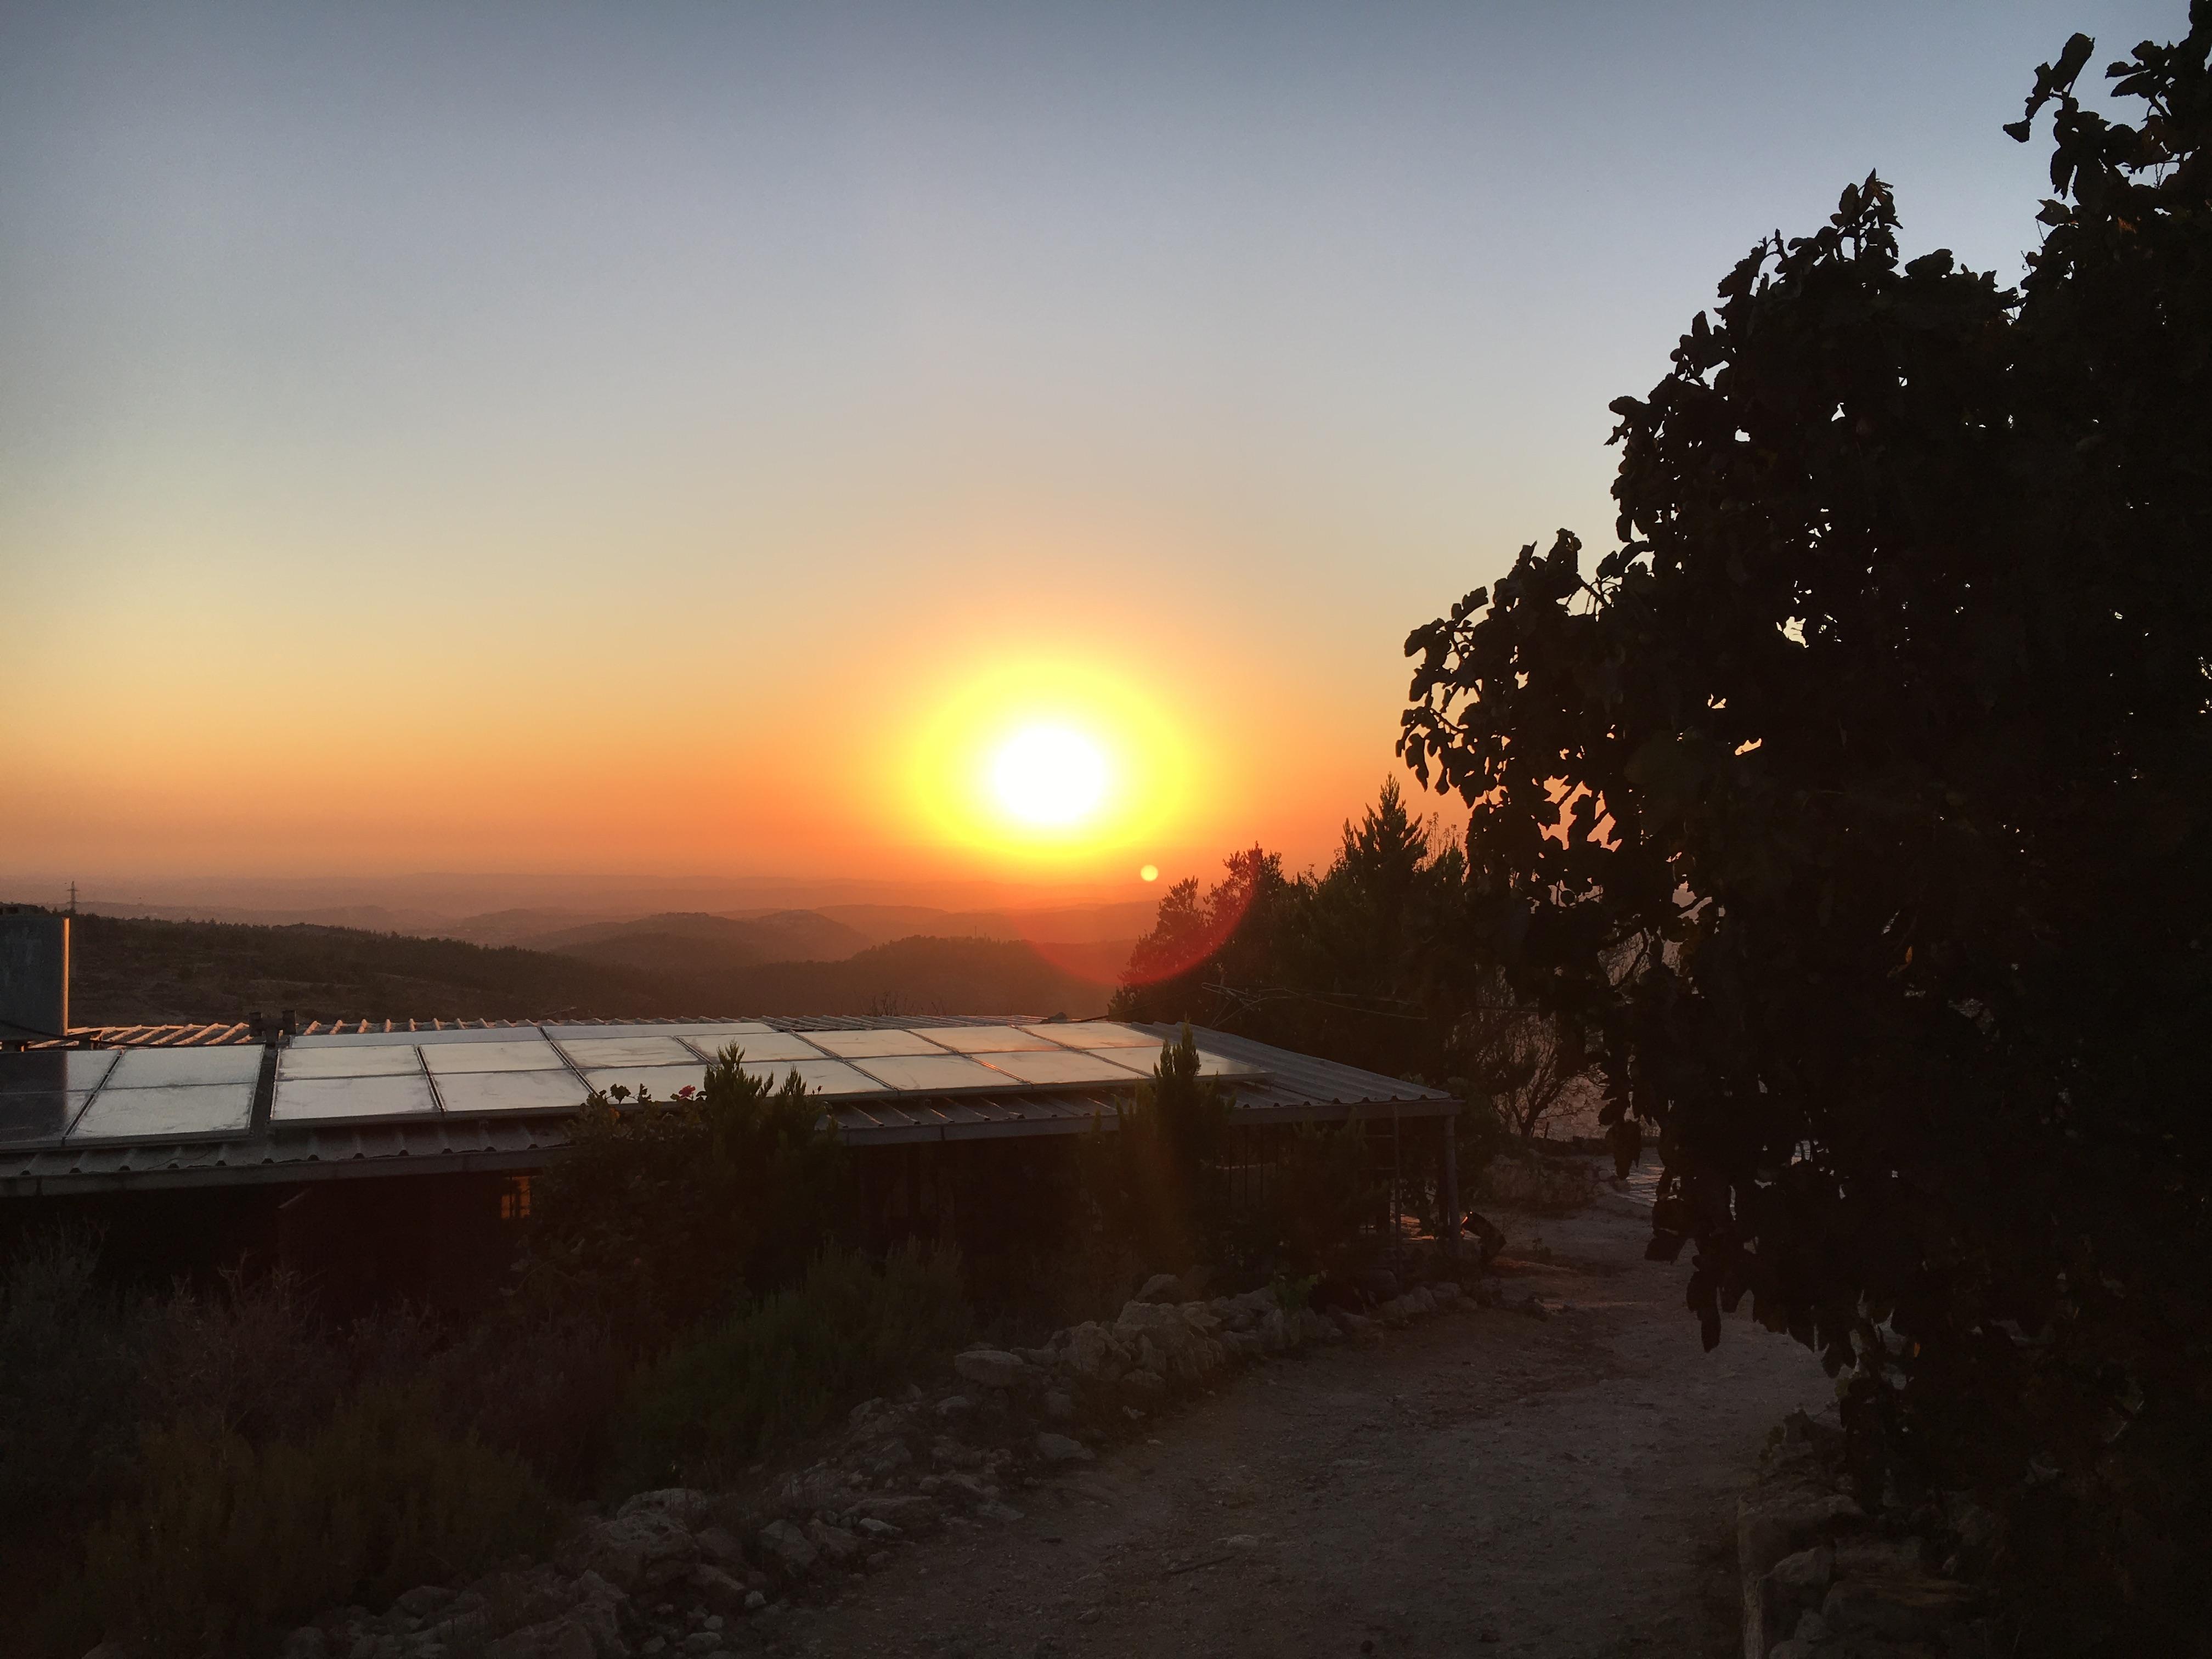 sunset fig tree